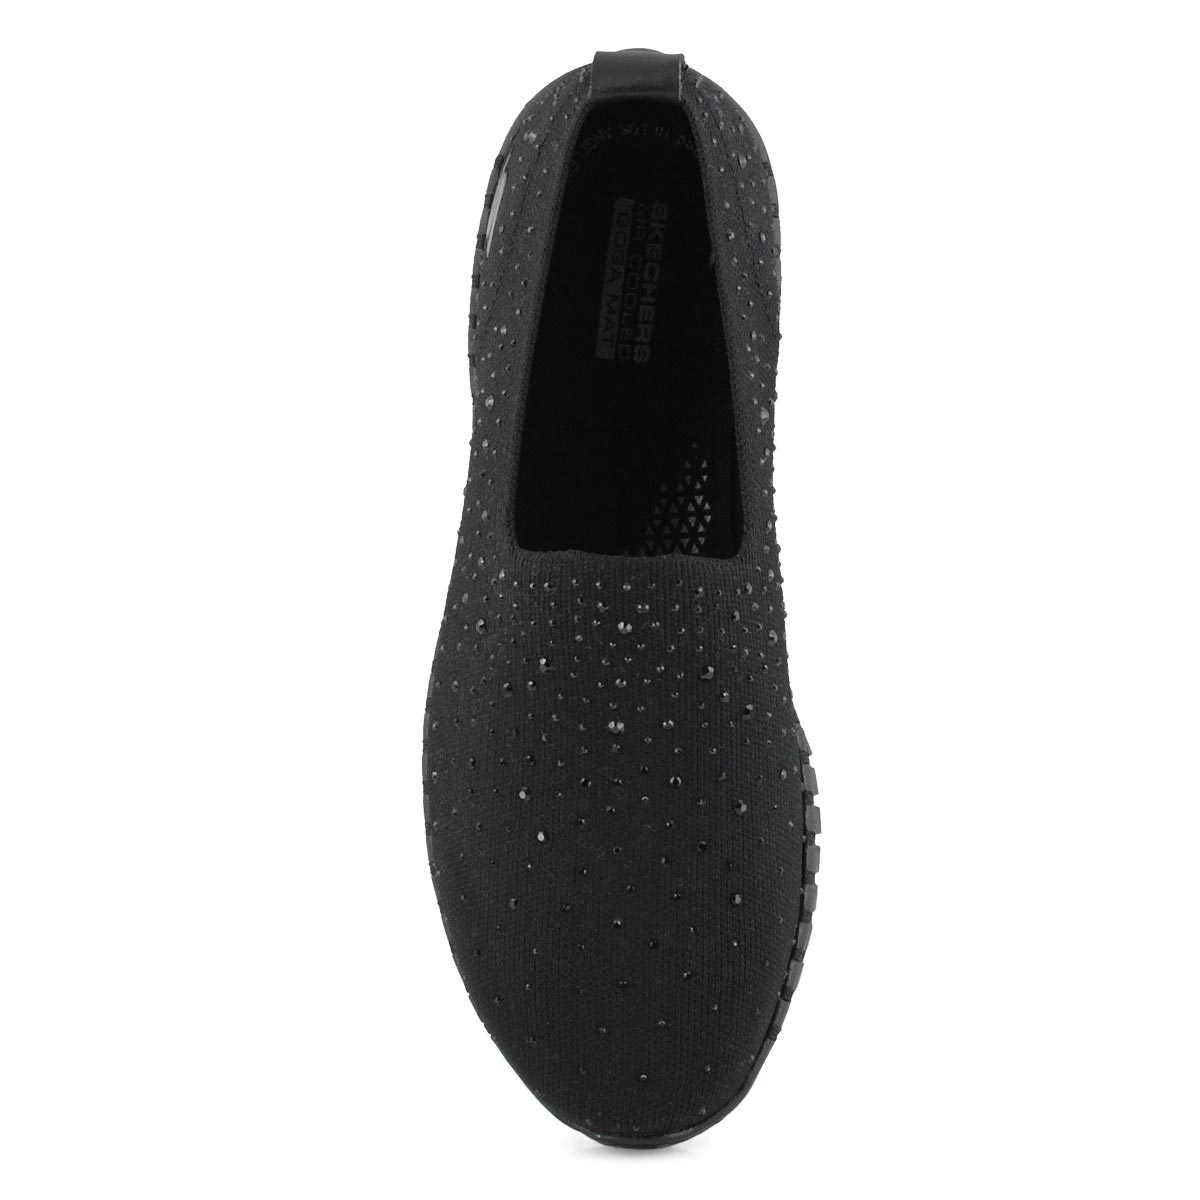 Lds GOwalk Smart blk/blk slip on shoe